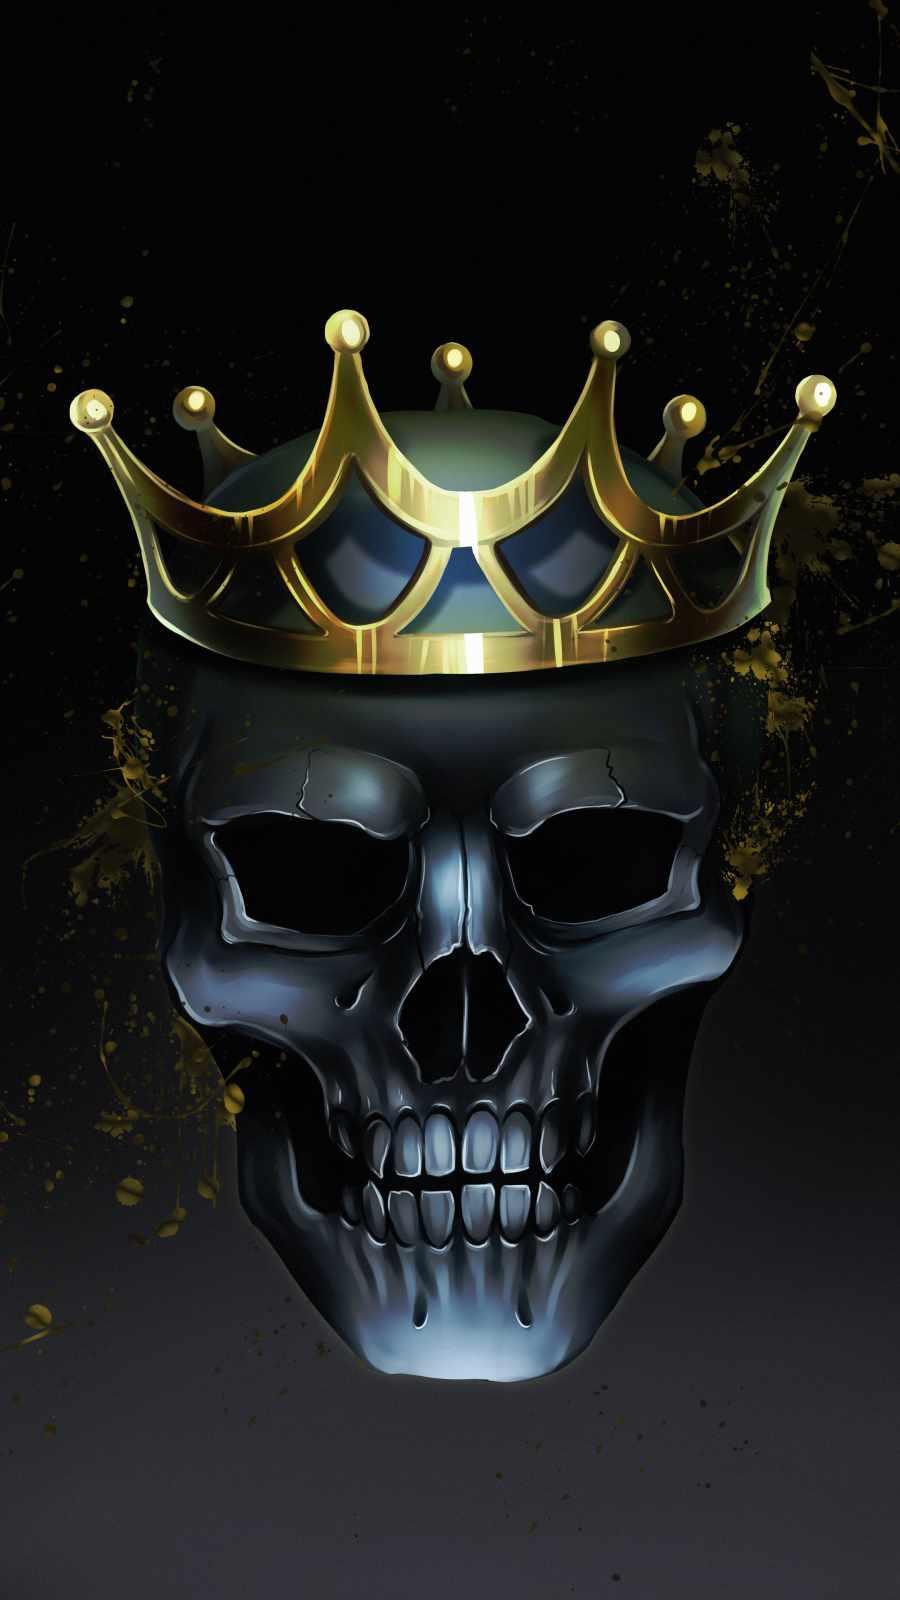 Skull King Crown